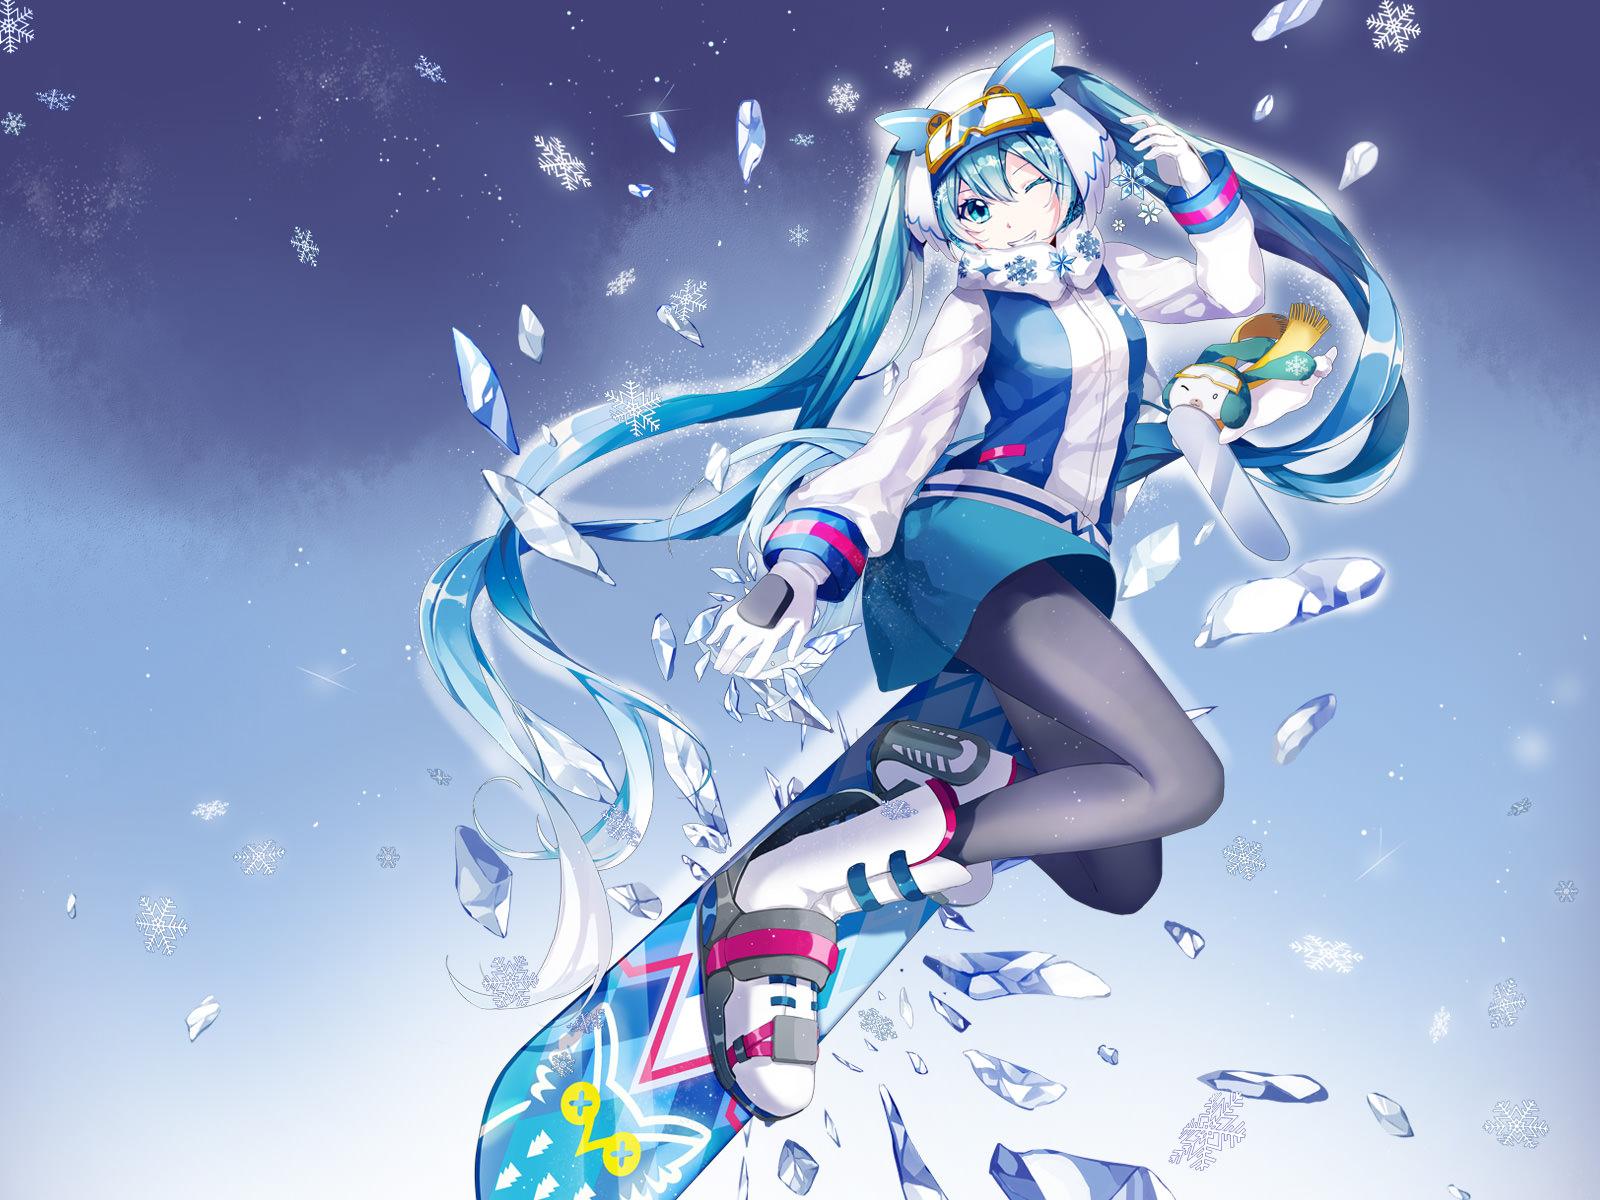 Drawn snow walpaper : Vocaloid http://snowmiku com/2016/images/top1 Snow